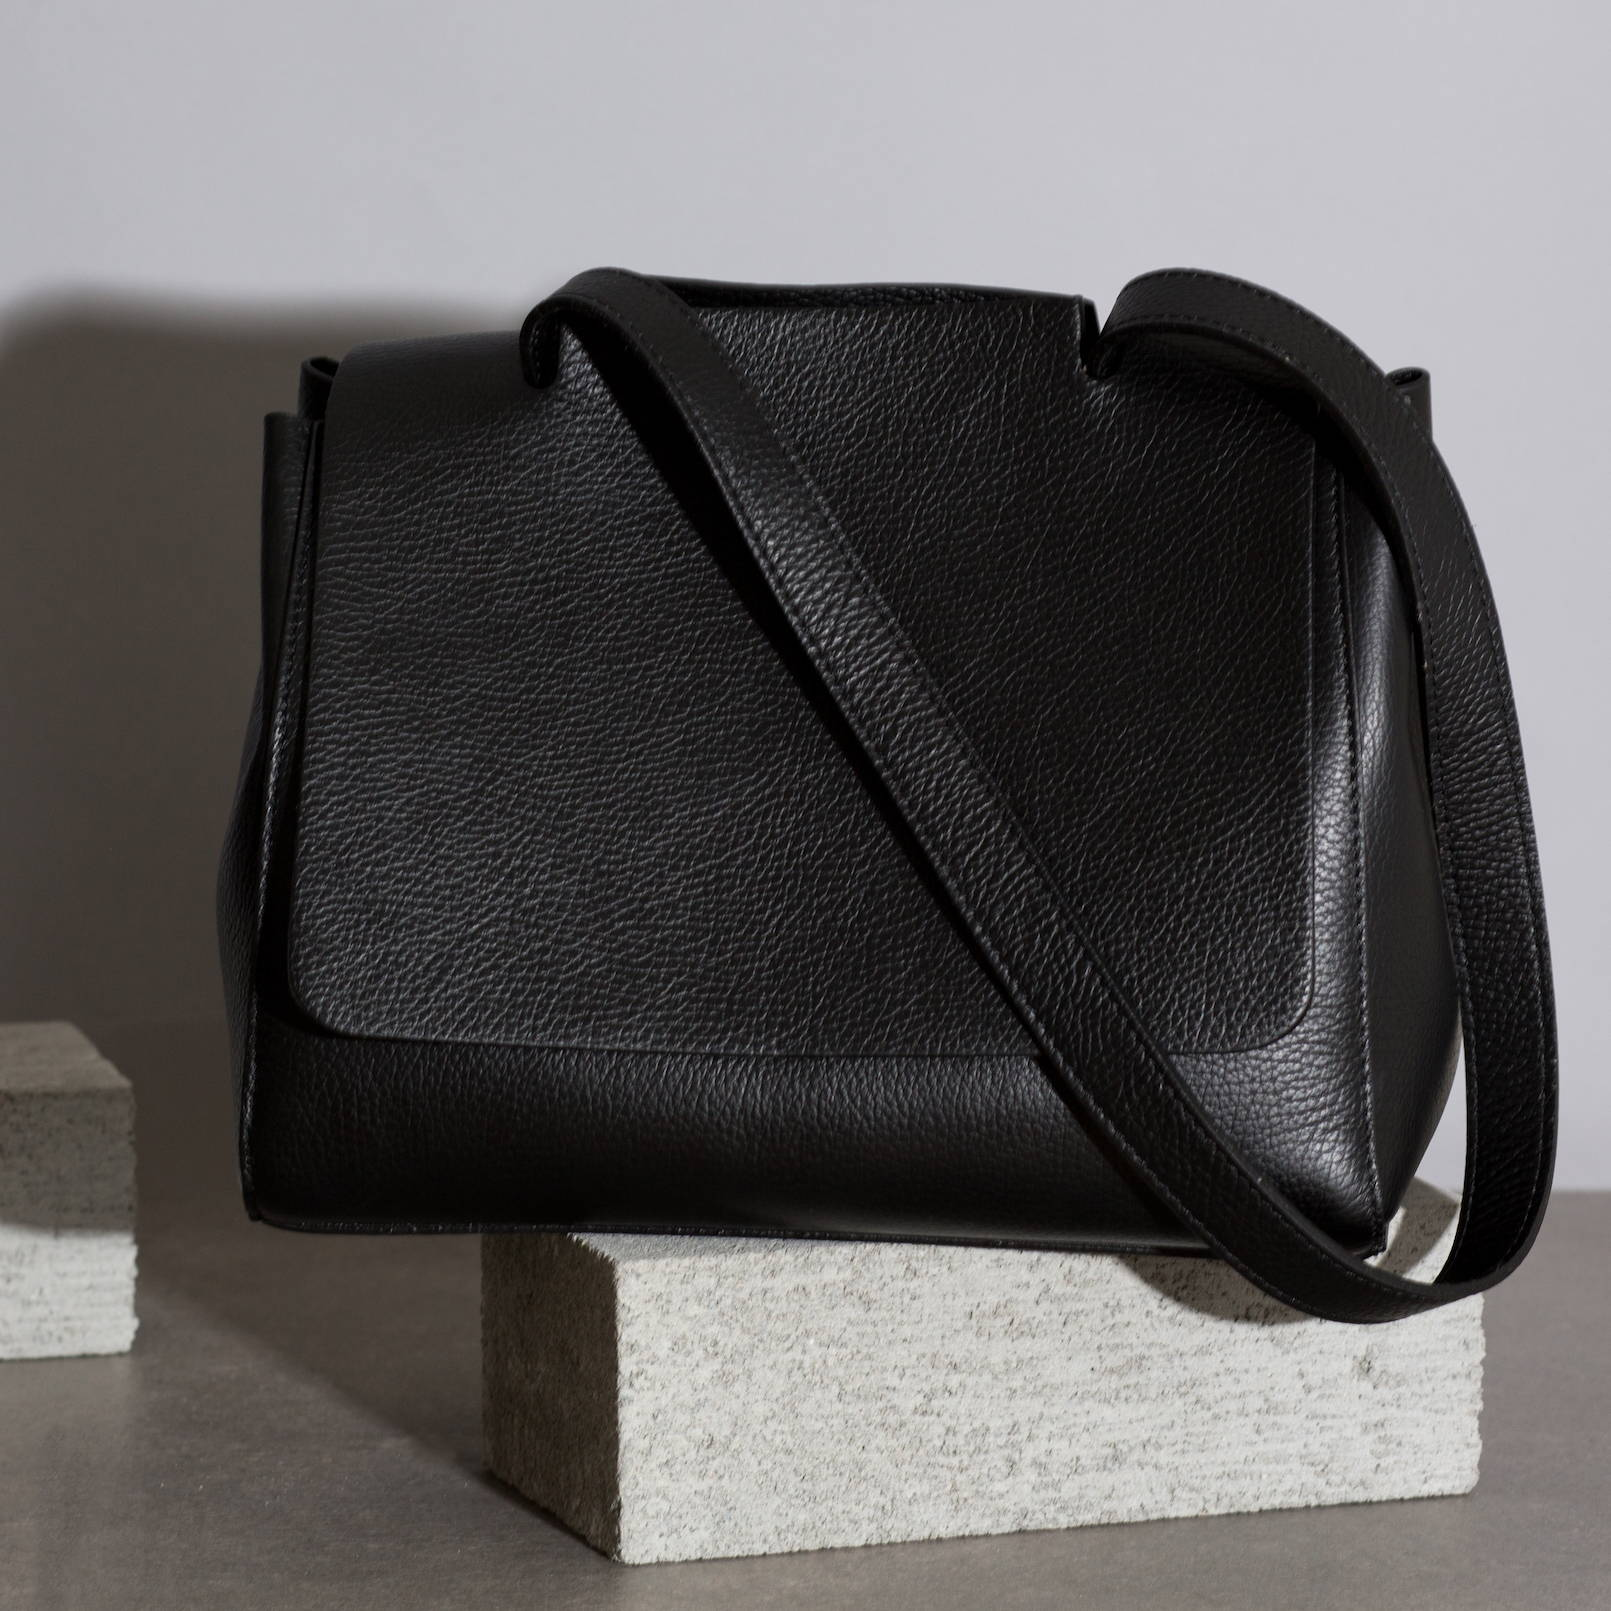 VESTIRSI leather handbag handmade in Italy KATIE travel bag work office handbag pebbled leather